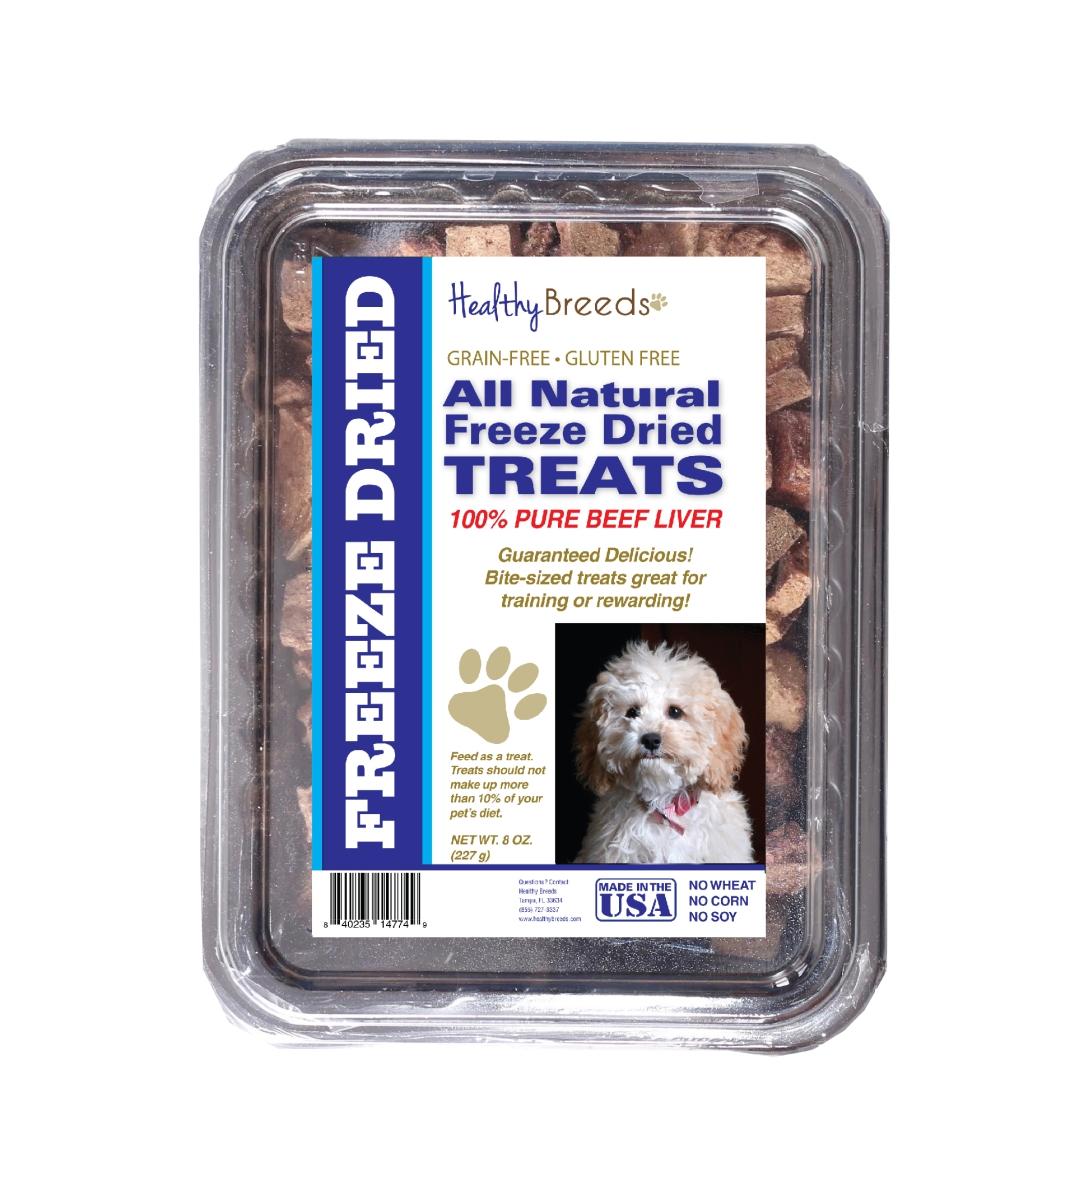 Healthy Breeds 840235148111 10 oz Cockapoo All Natural Freeze Dried Treats Beef Liver